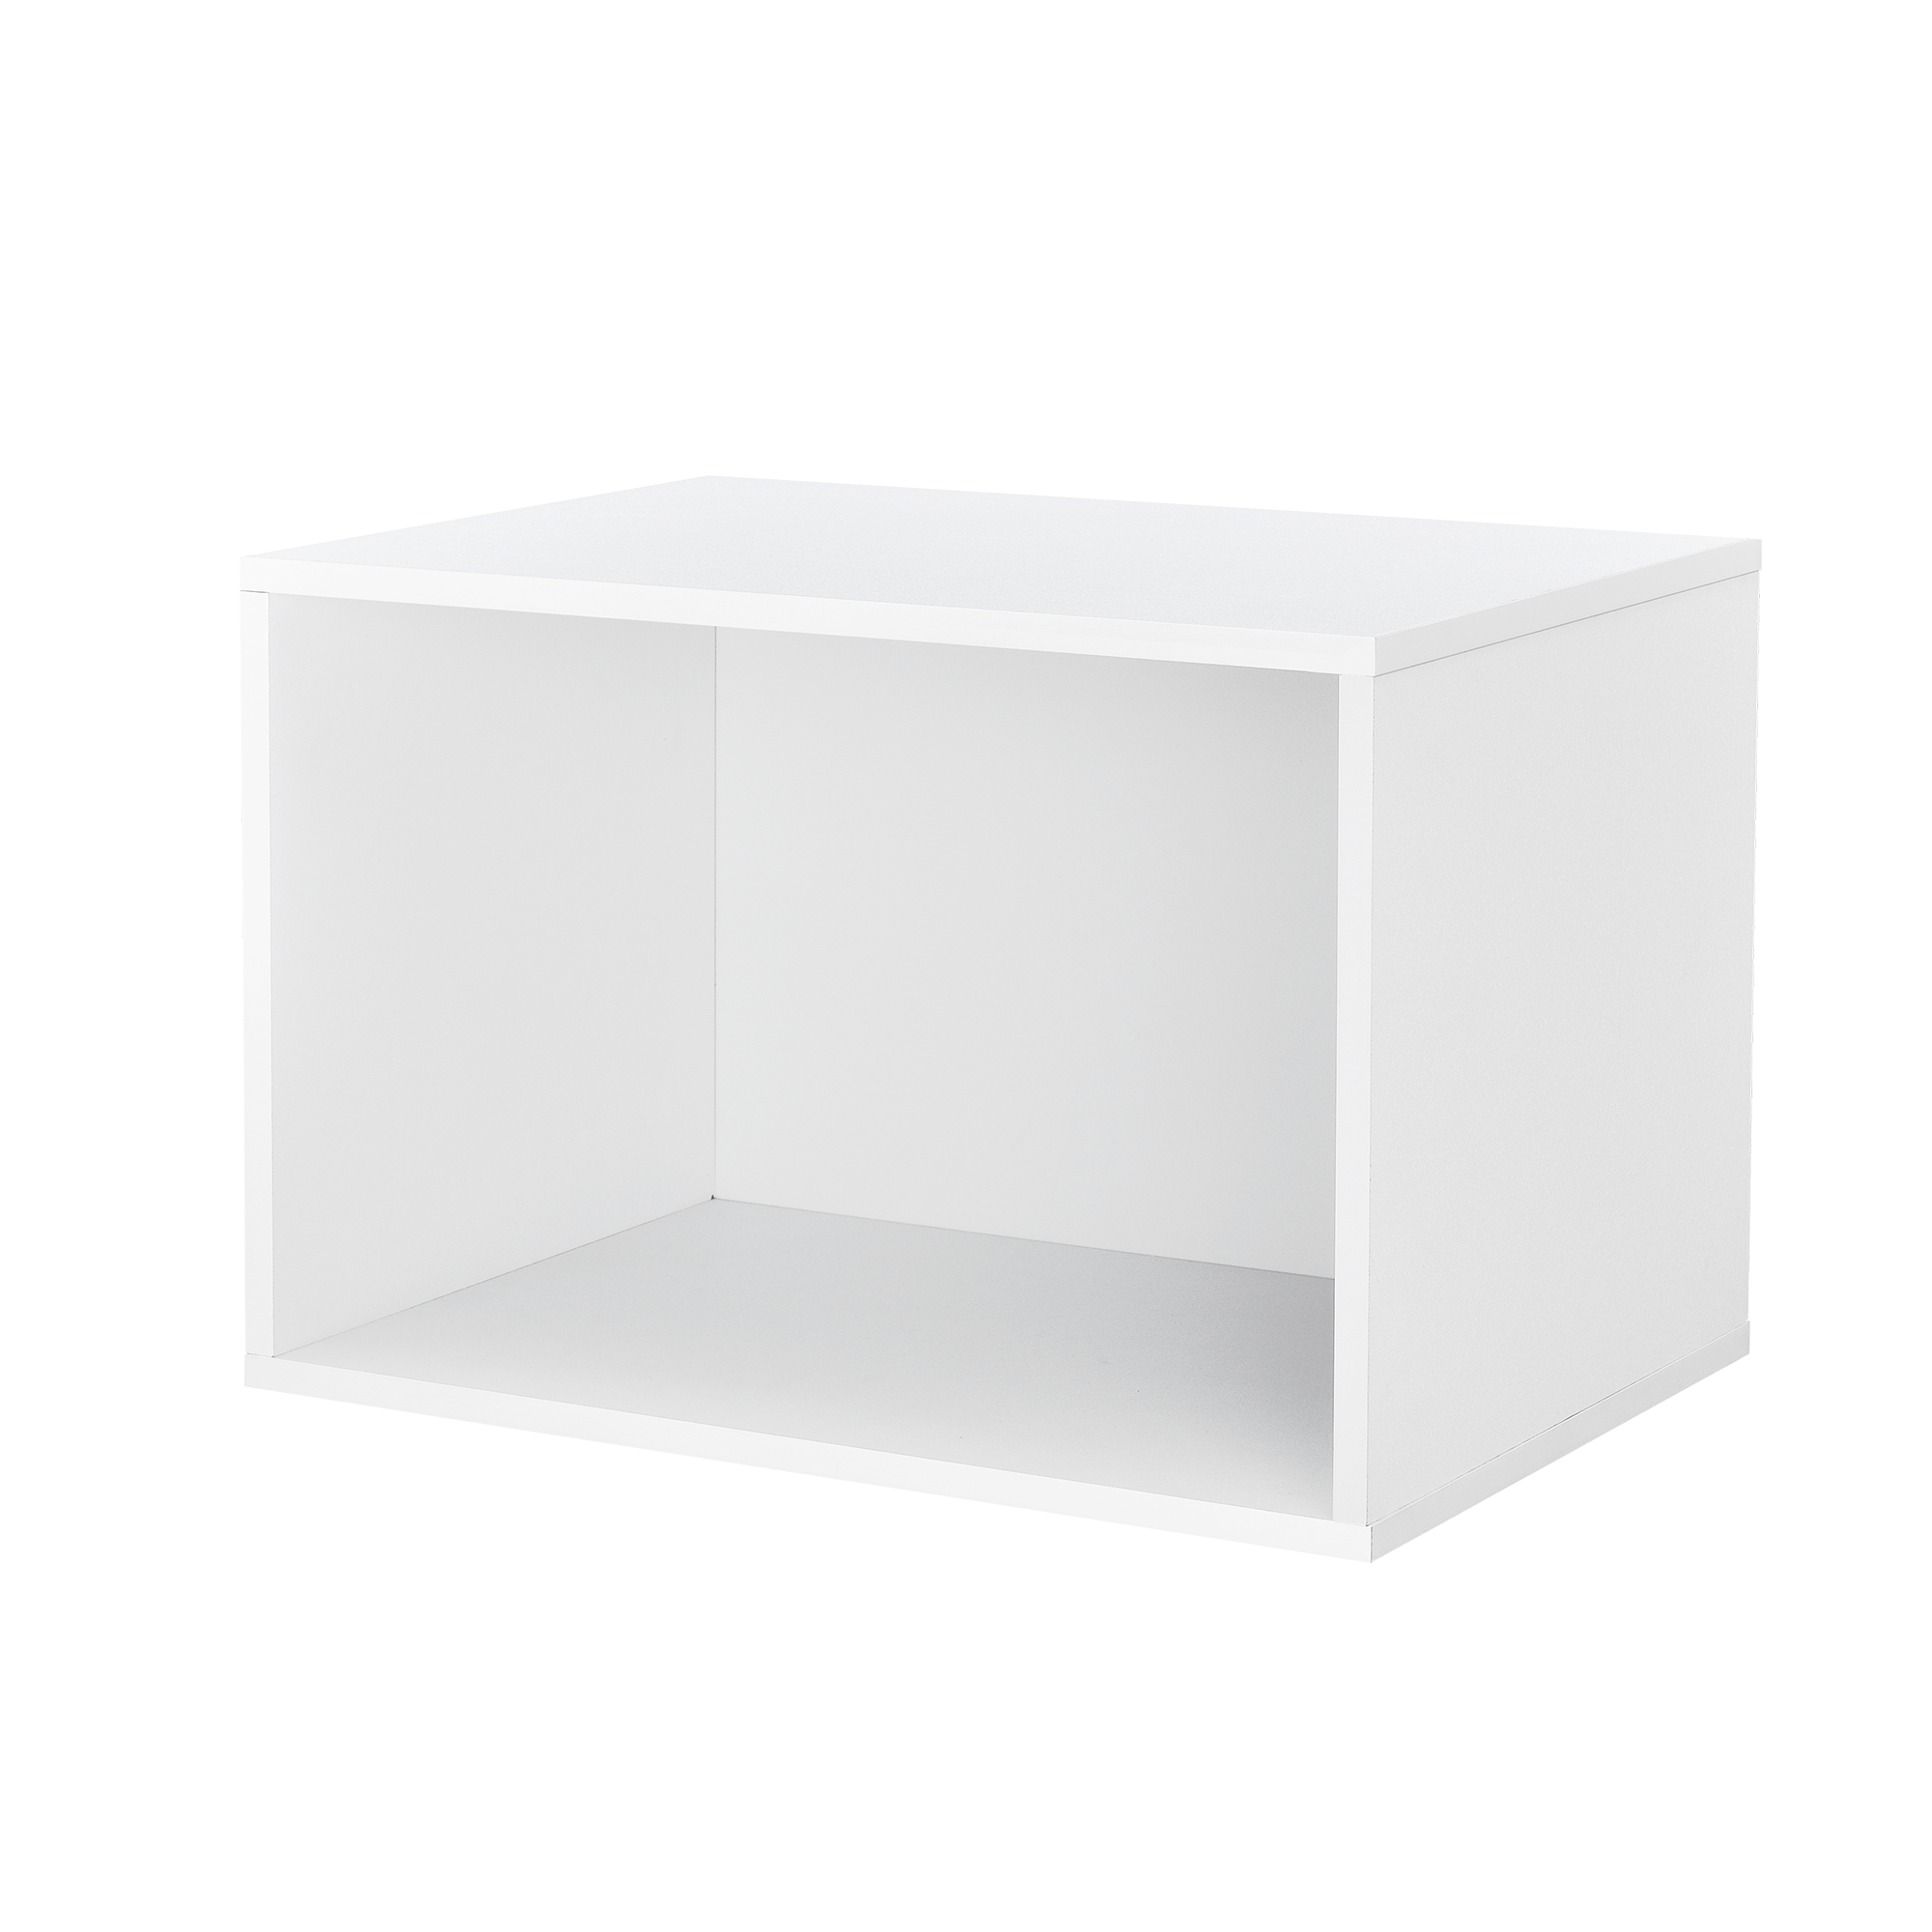 regal 45x30x30cm wei wandregal h ngeregal b cherregal kombinierbar ebay. Black Bedroom Furniture Sets. Home Design Ideas